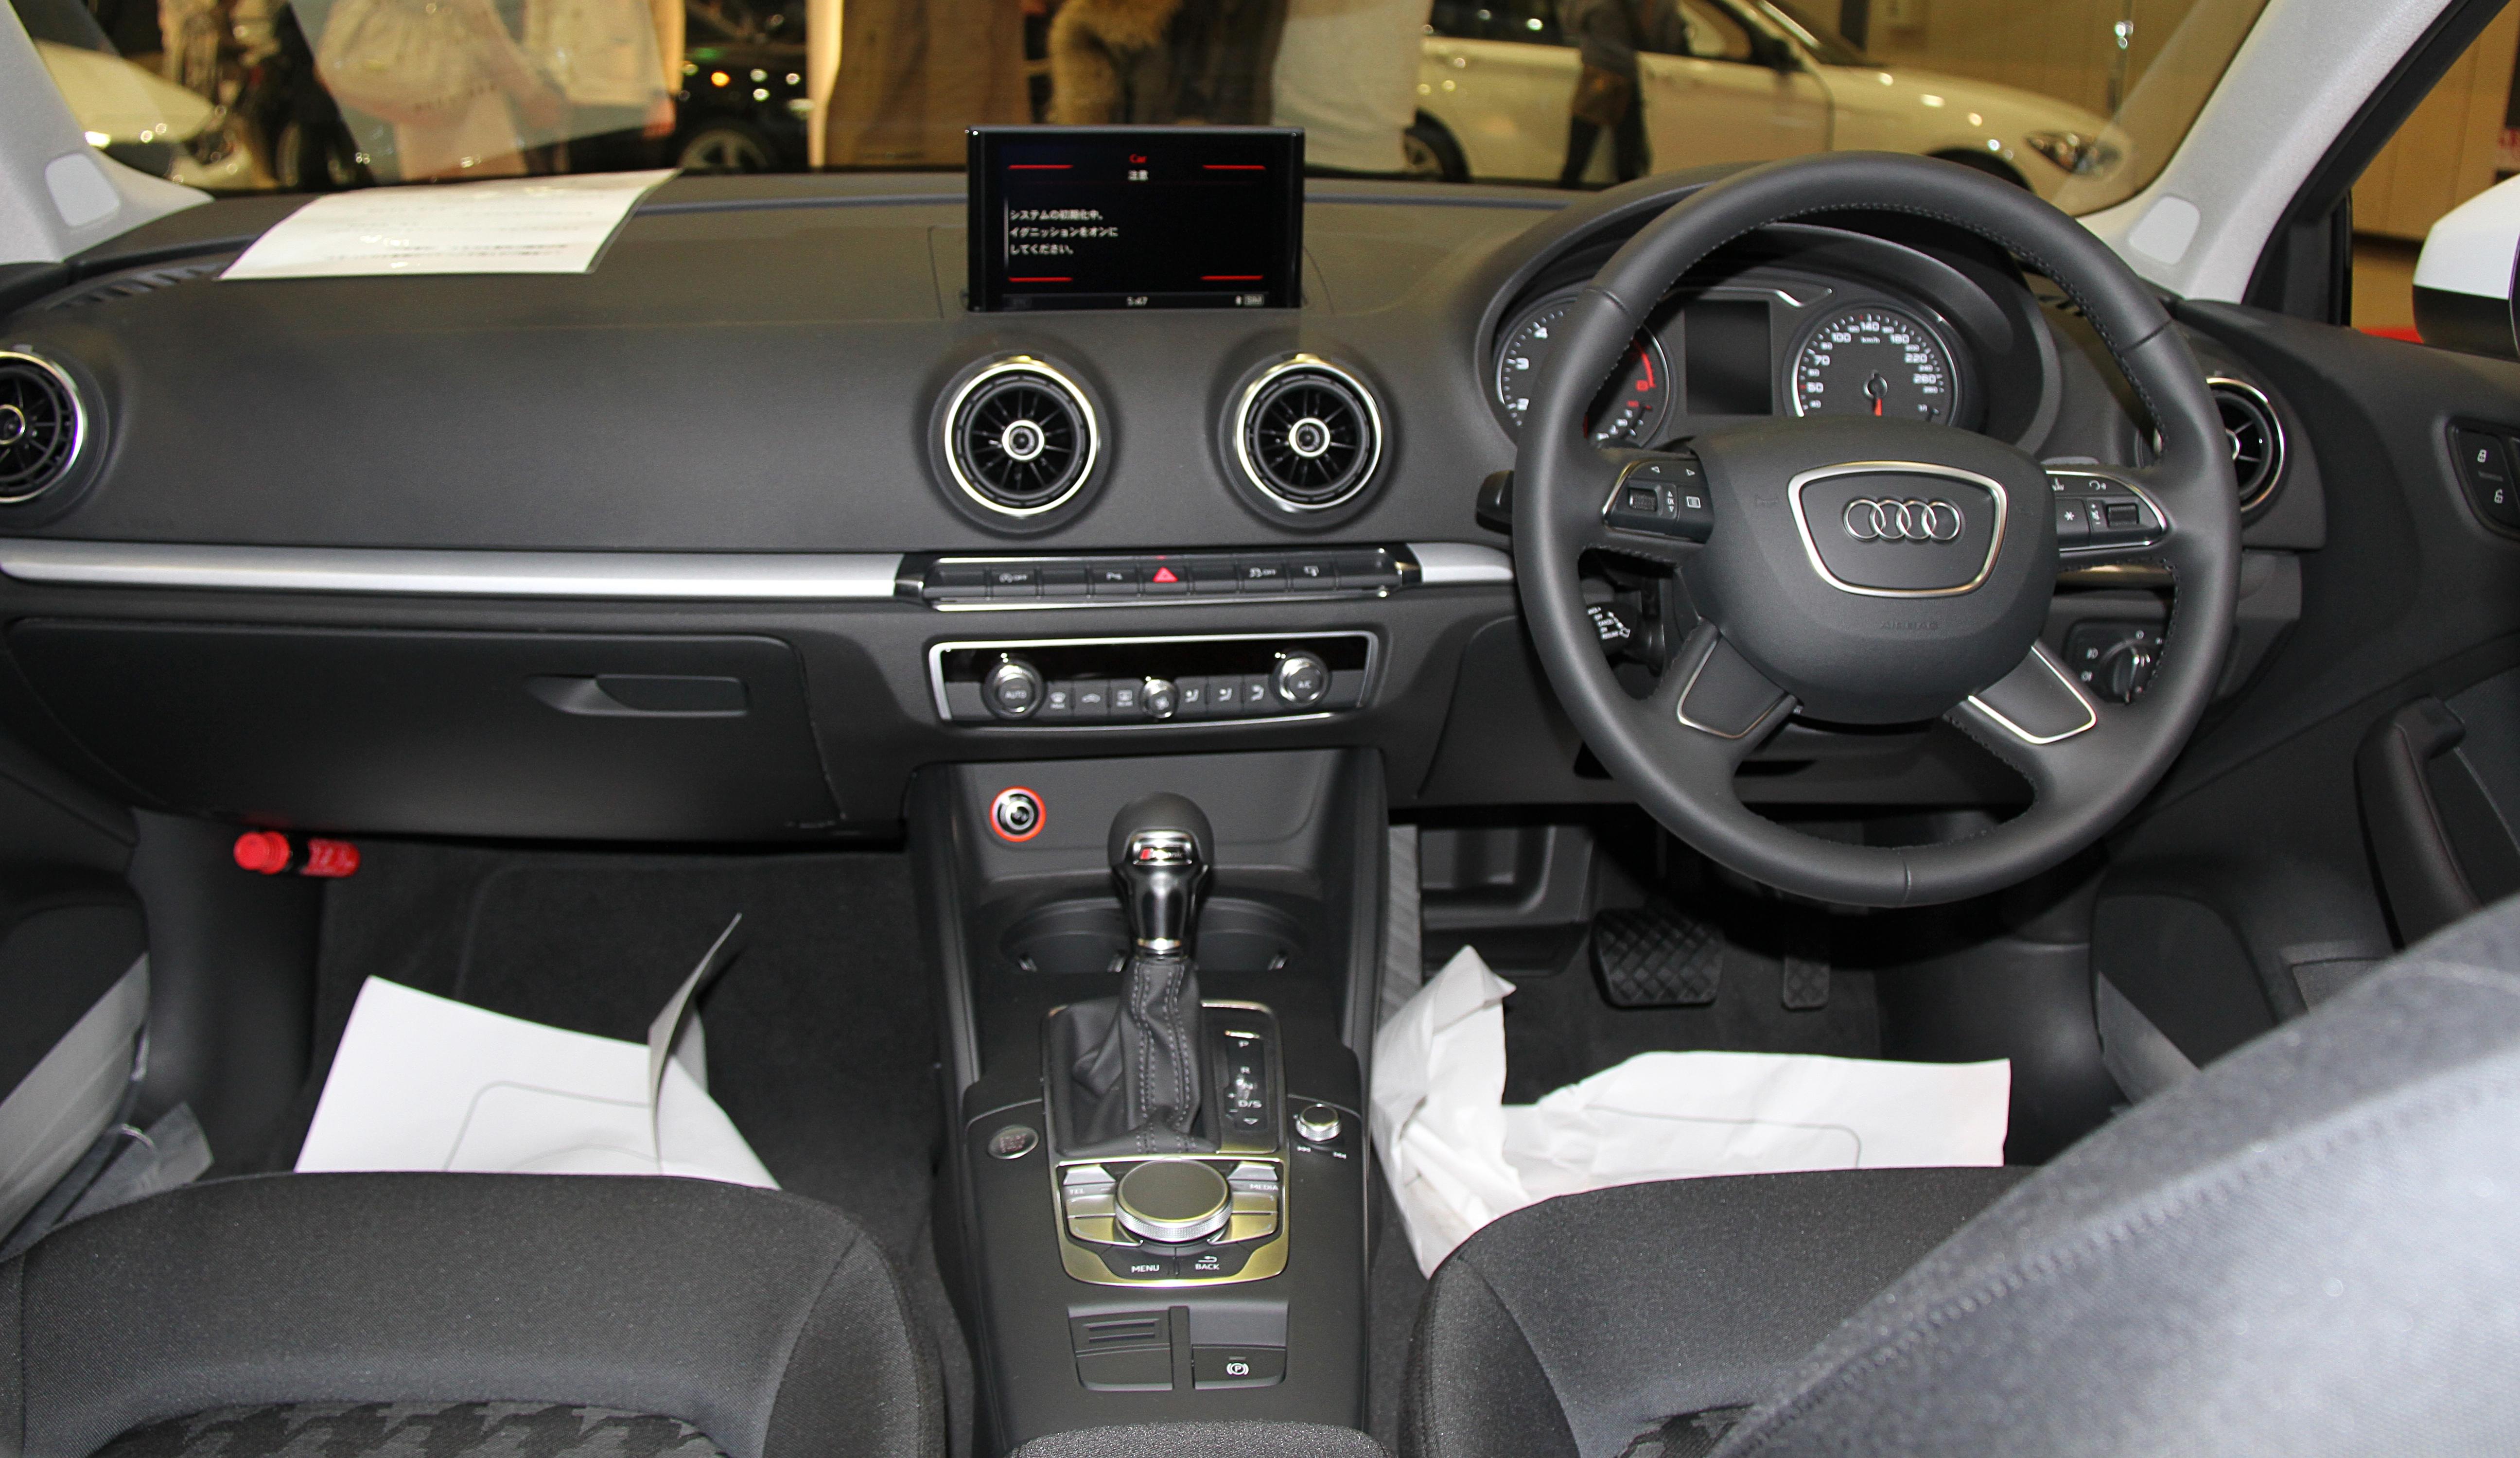 File:Audi A3 Sedan 1.4 TFSI interior.jpg